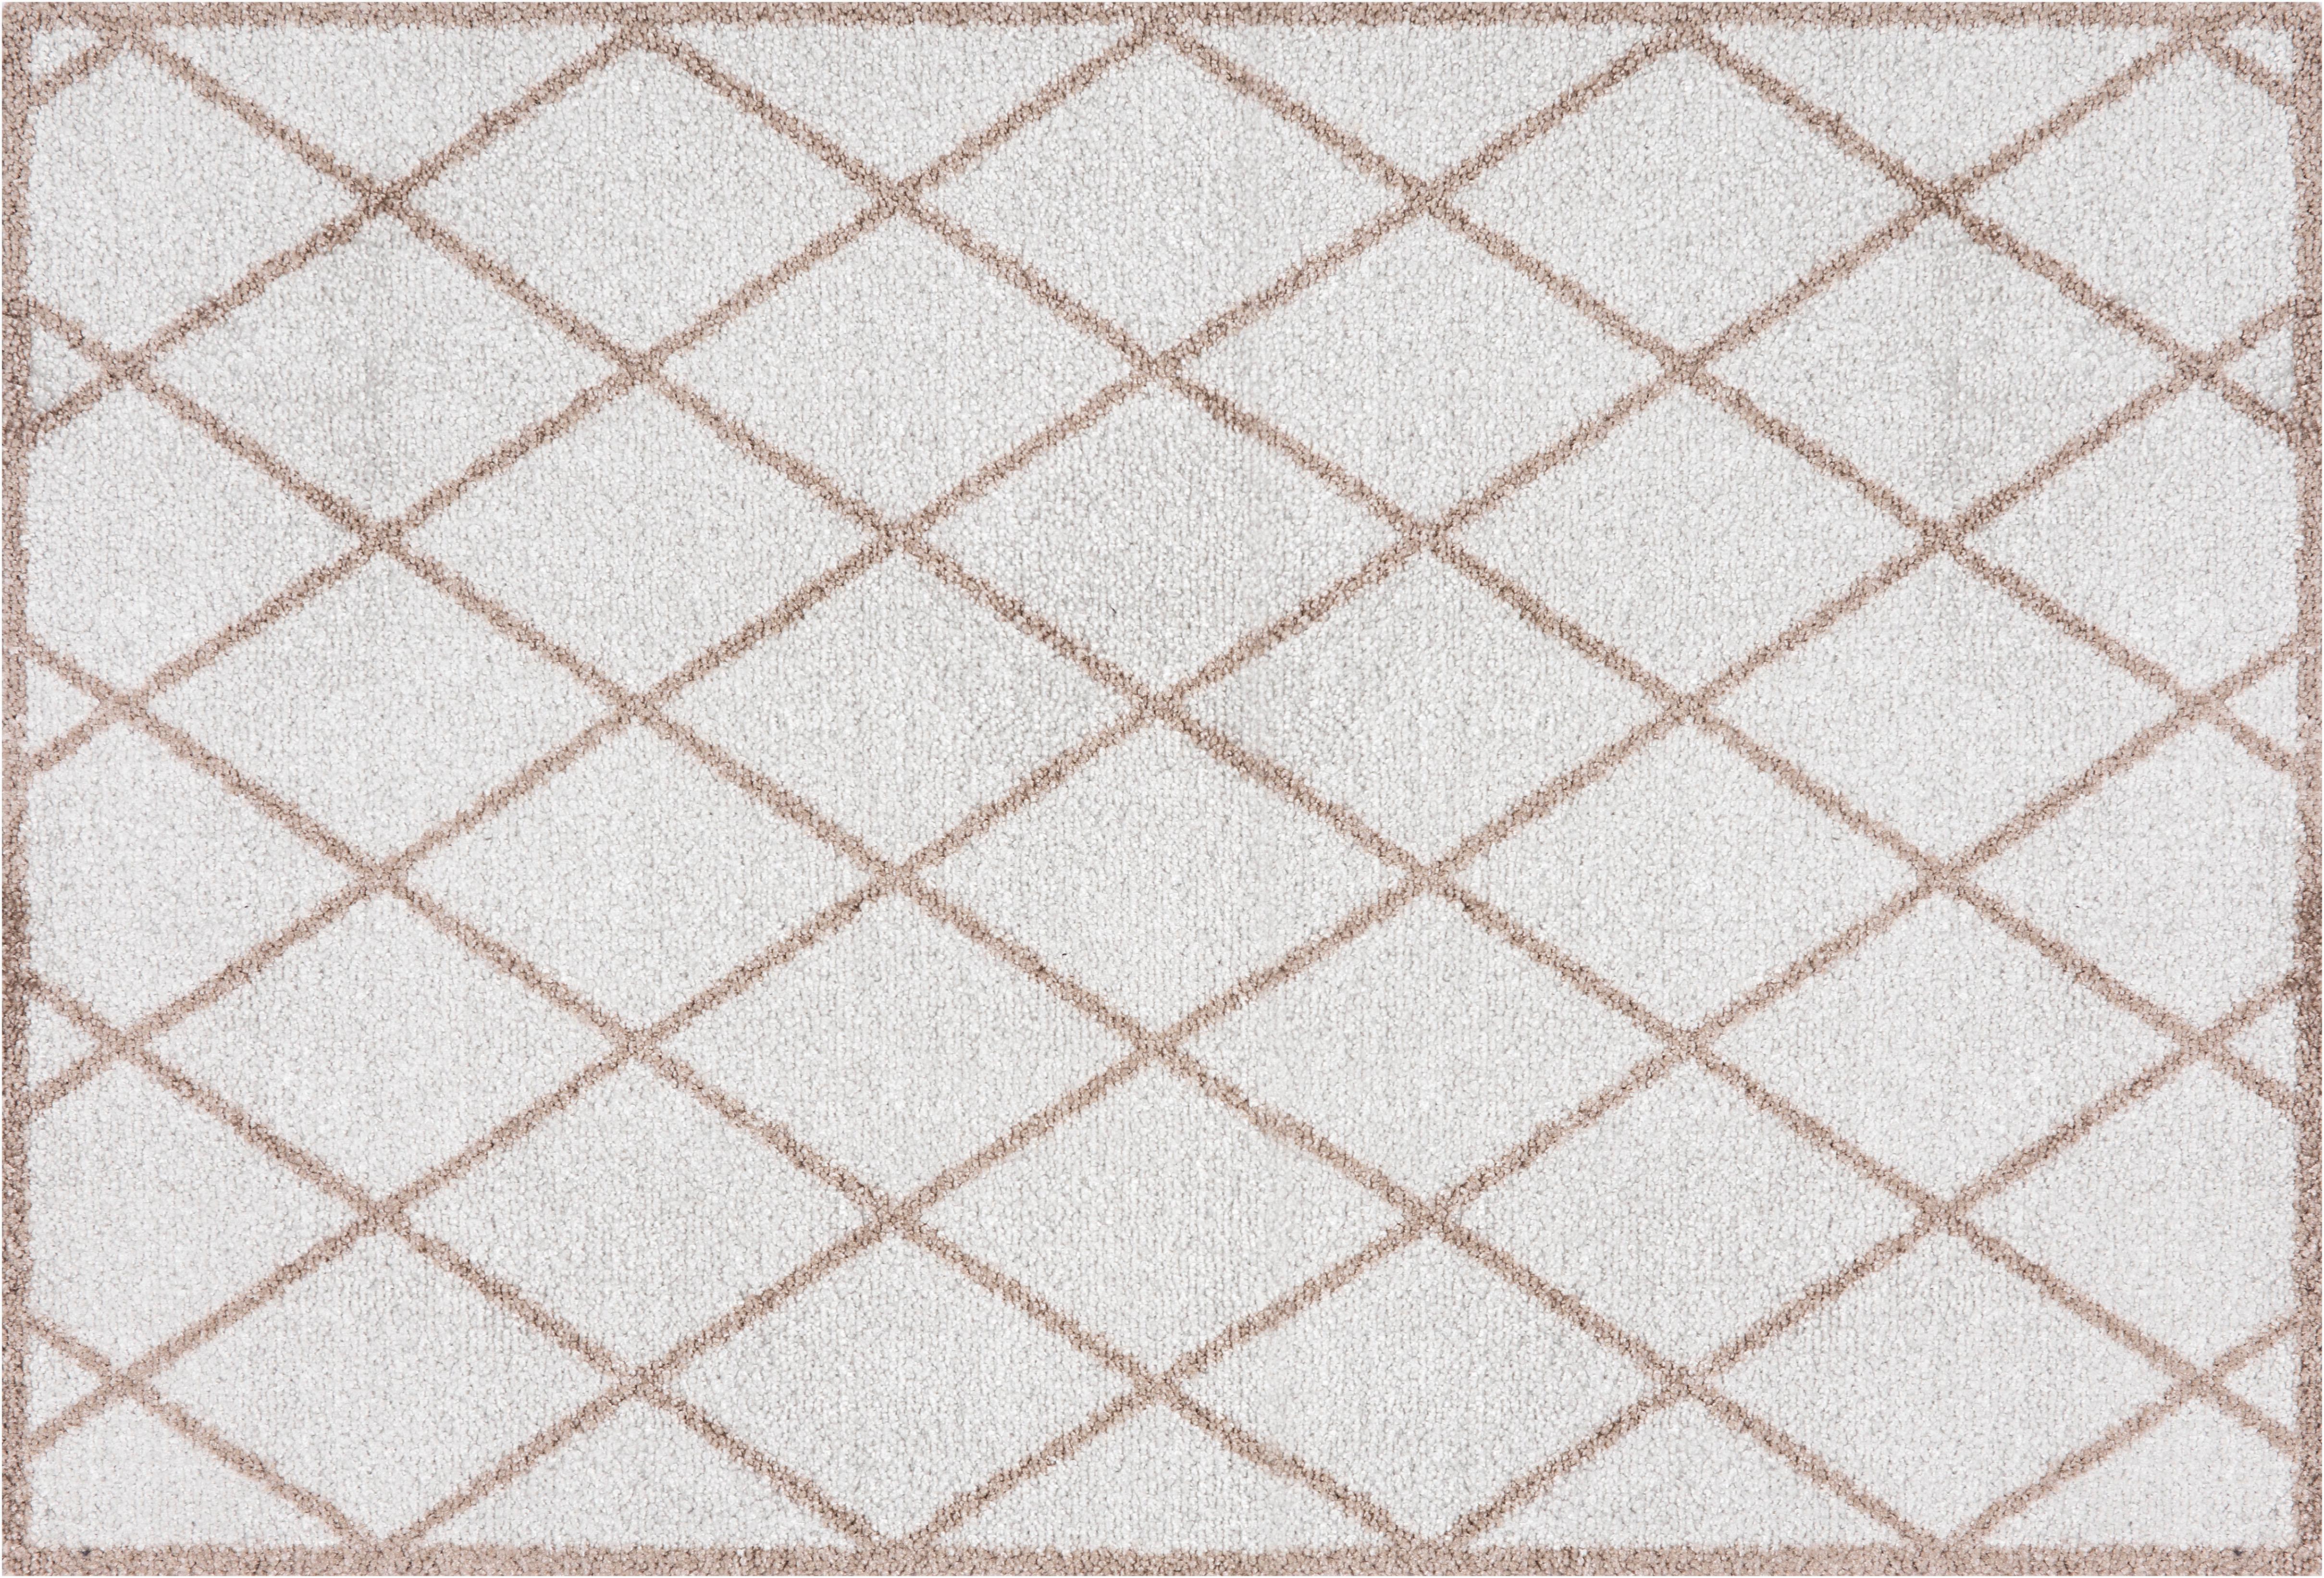 Fußmatte Scale Zala Living rechteckig Höhe 7 mm maschinell getuftet